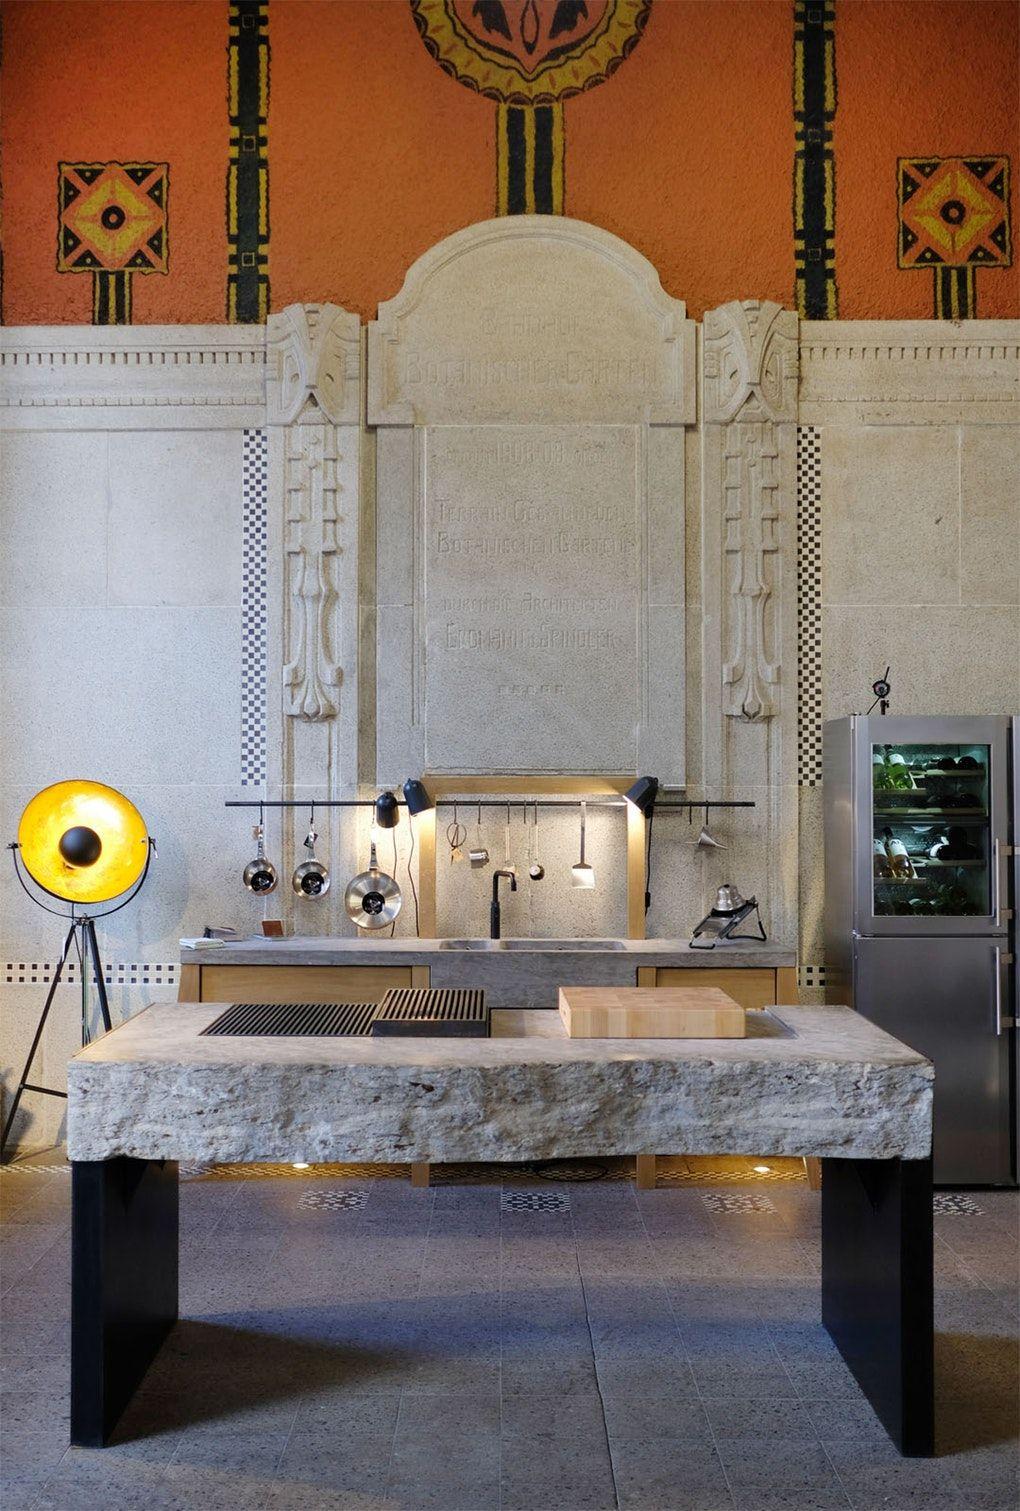 Kuchen Unikate Eclectic Home Home Decor Interior Design